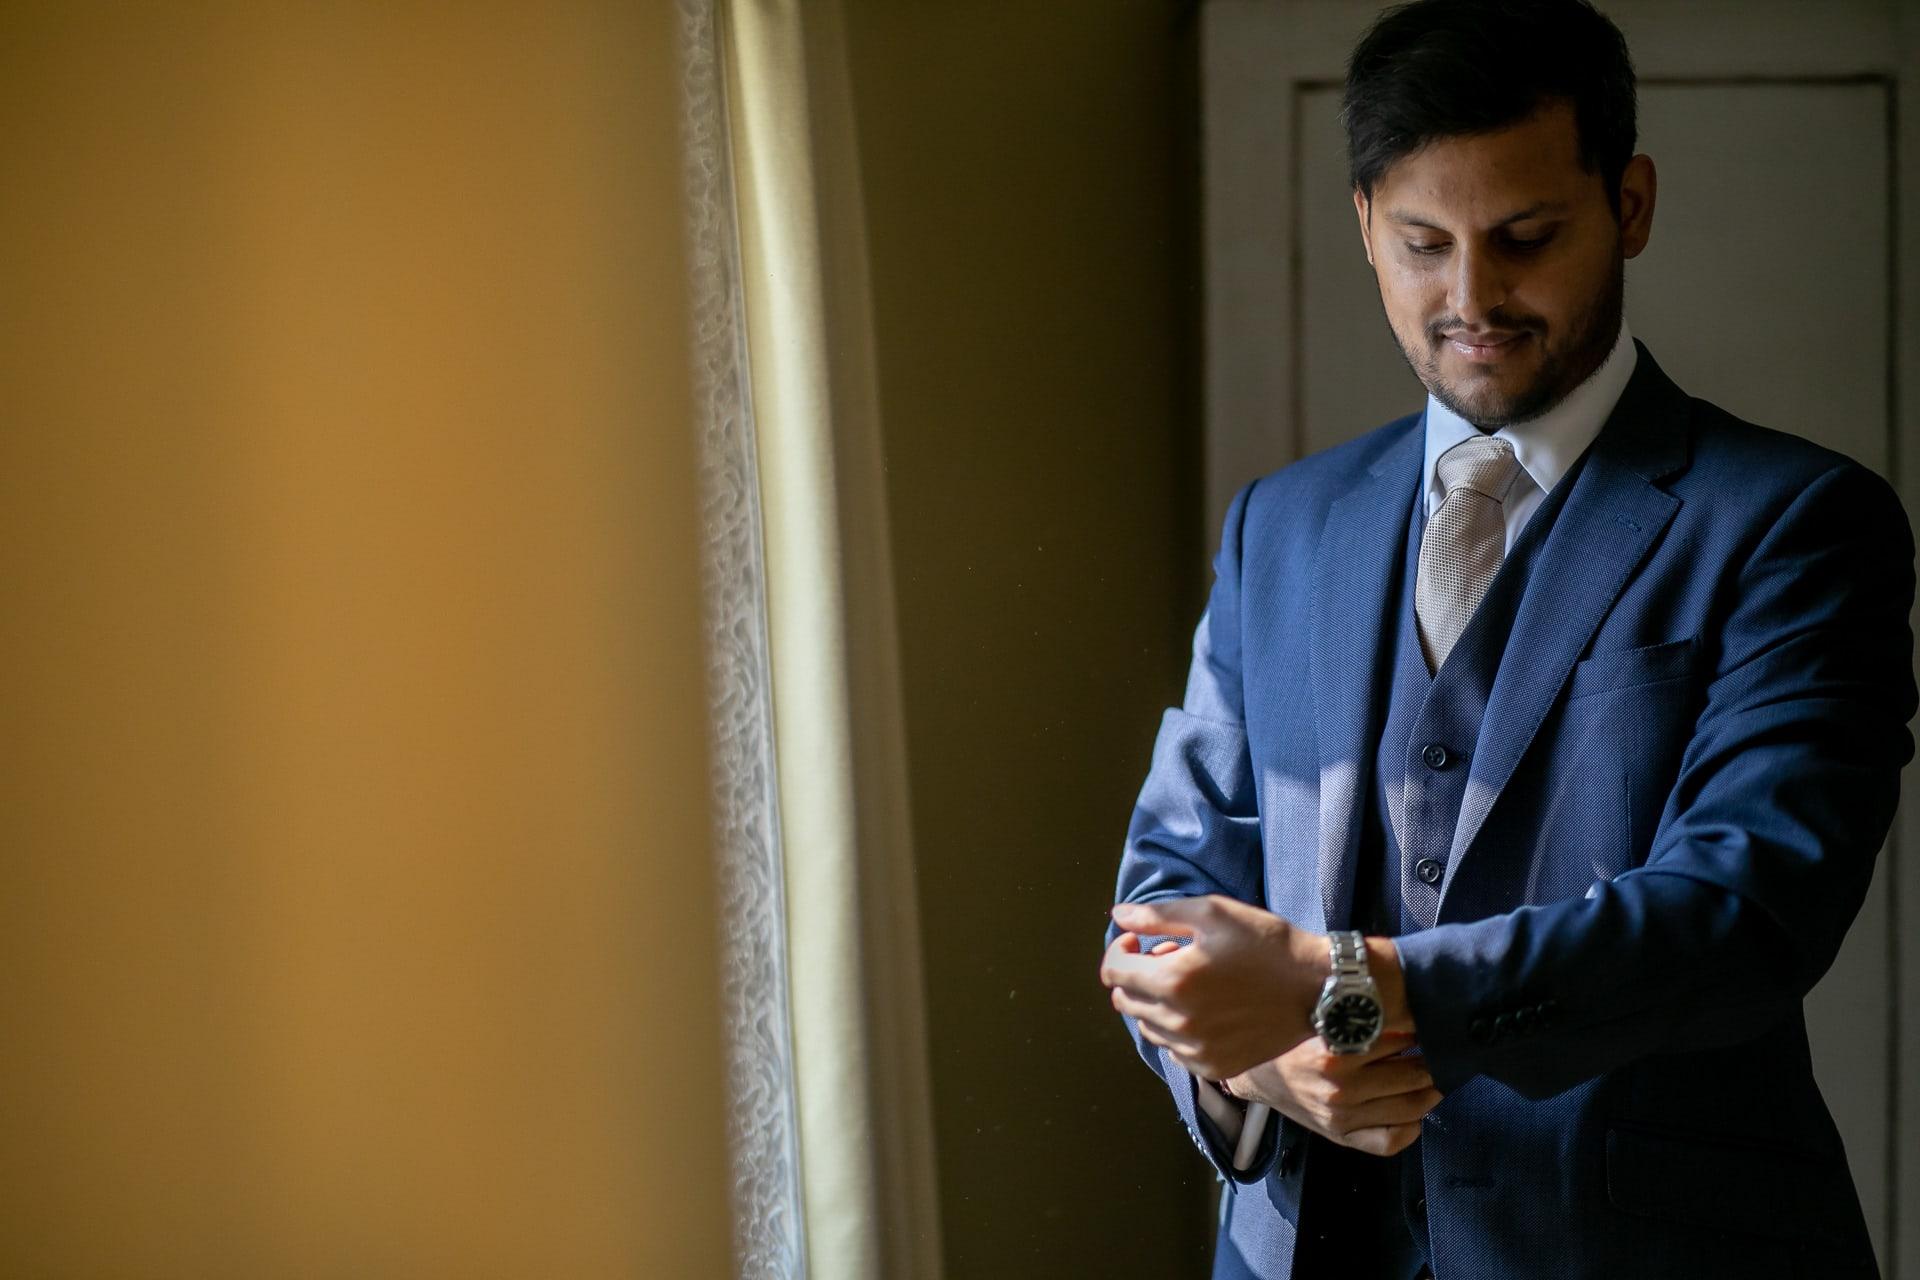 Groom getting ready for Civil wedding